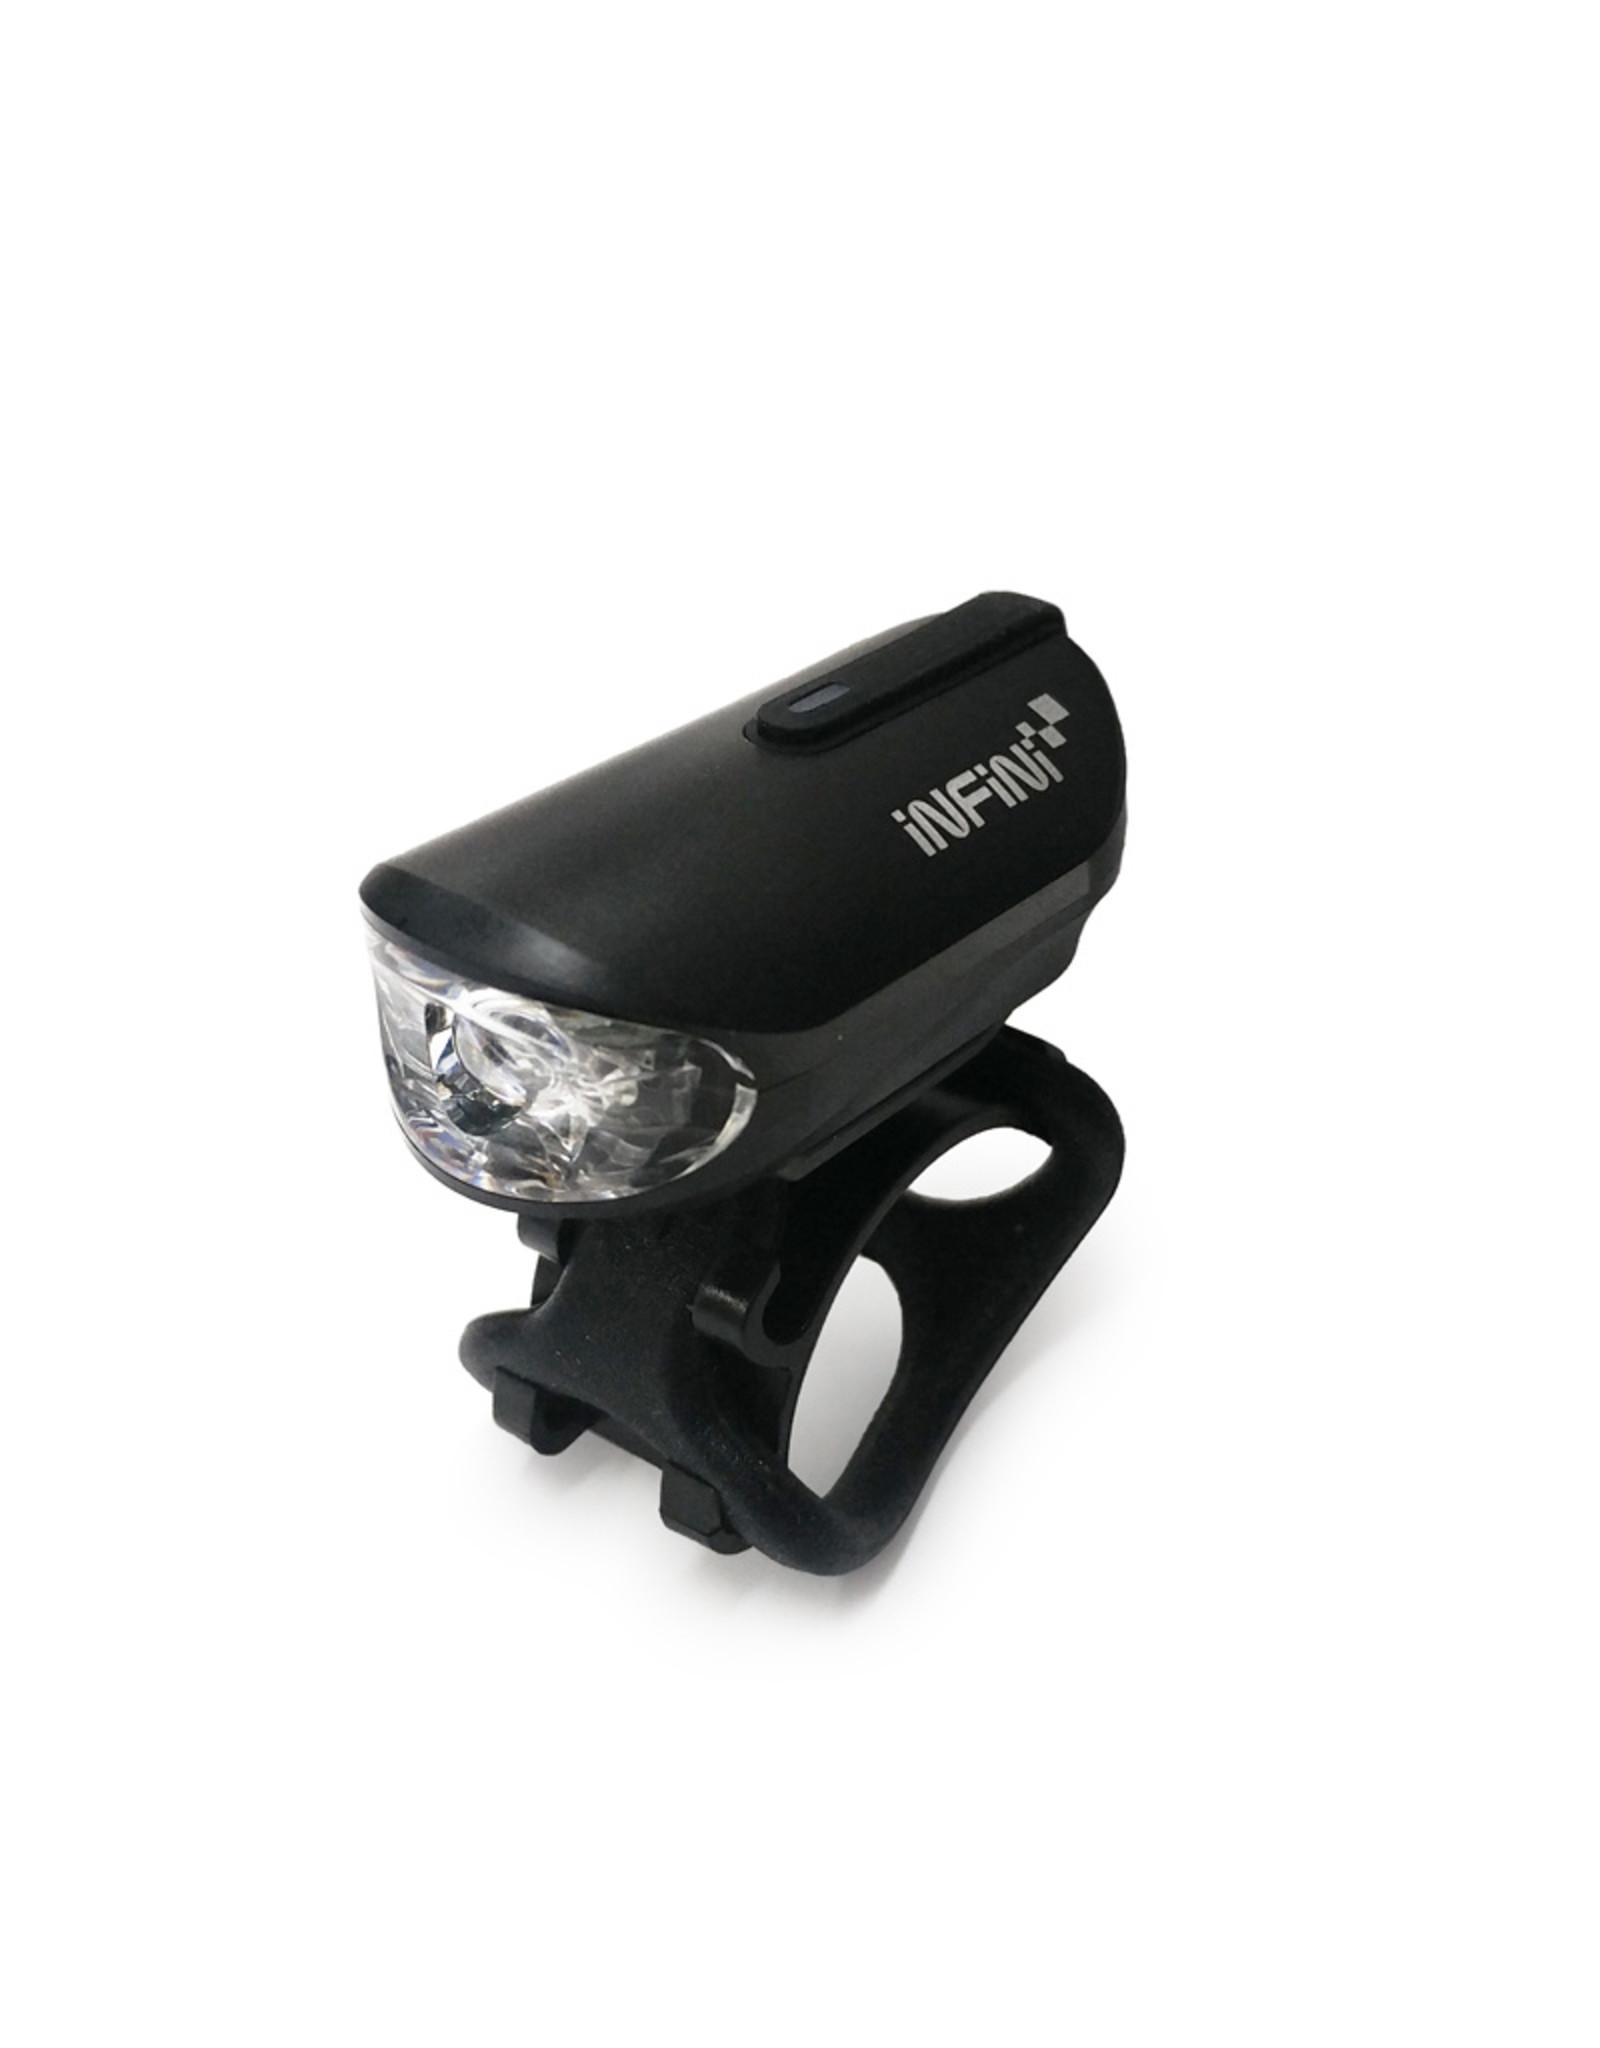 INFINI Infini I-210P Olley  USB Front Light